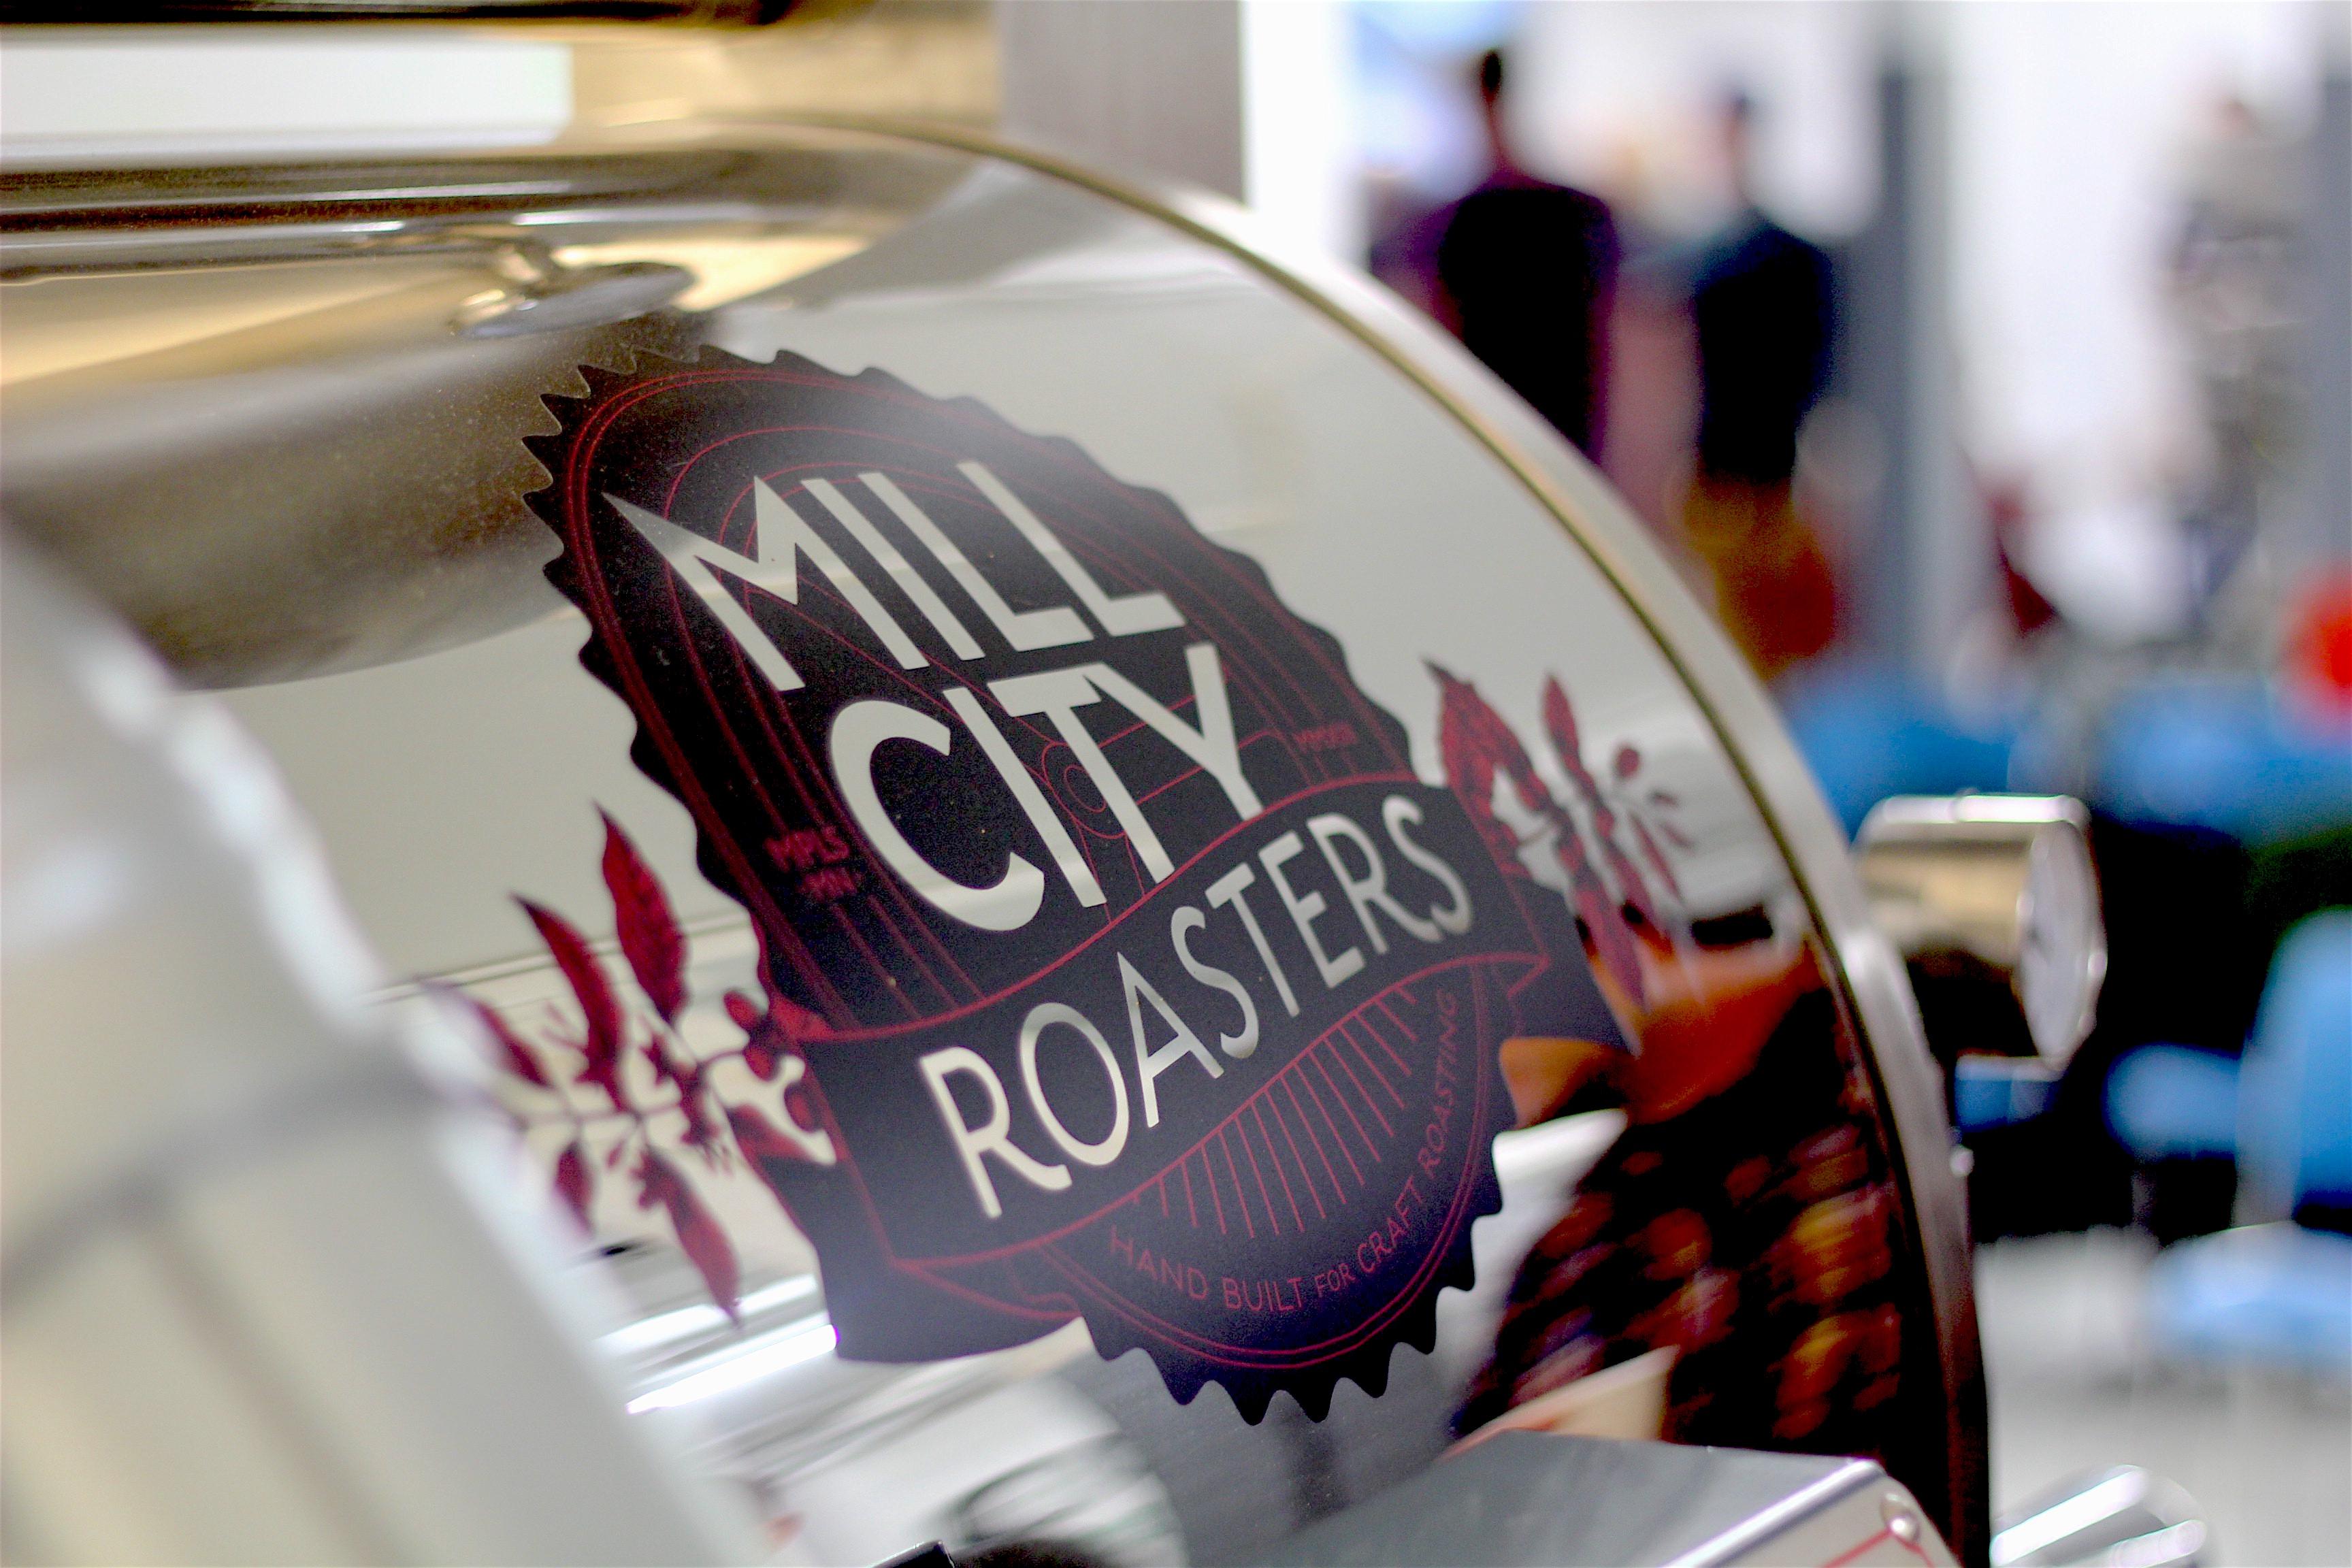 Mill City Roasters